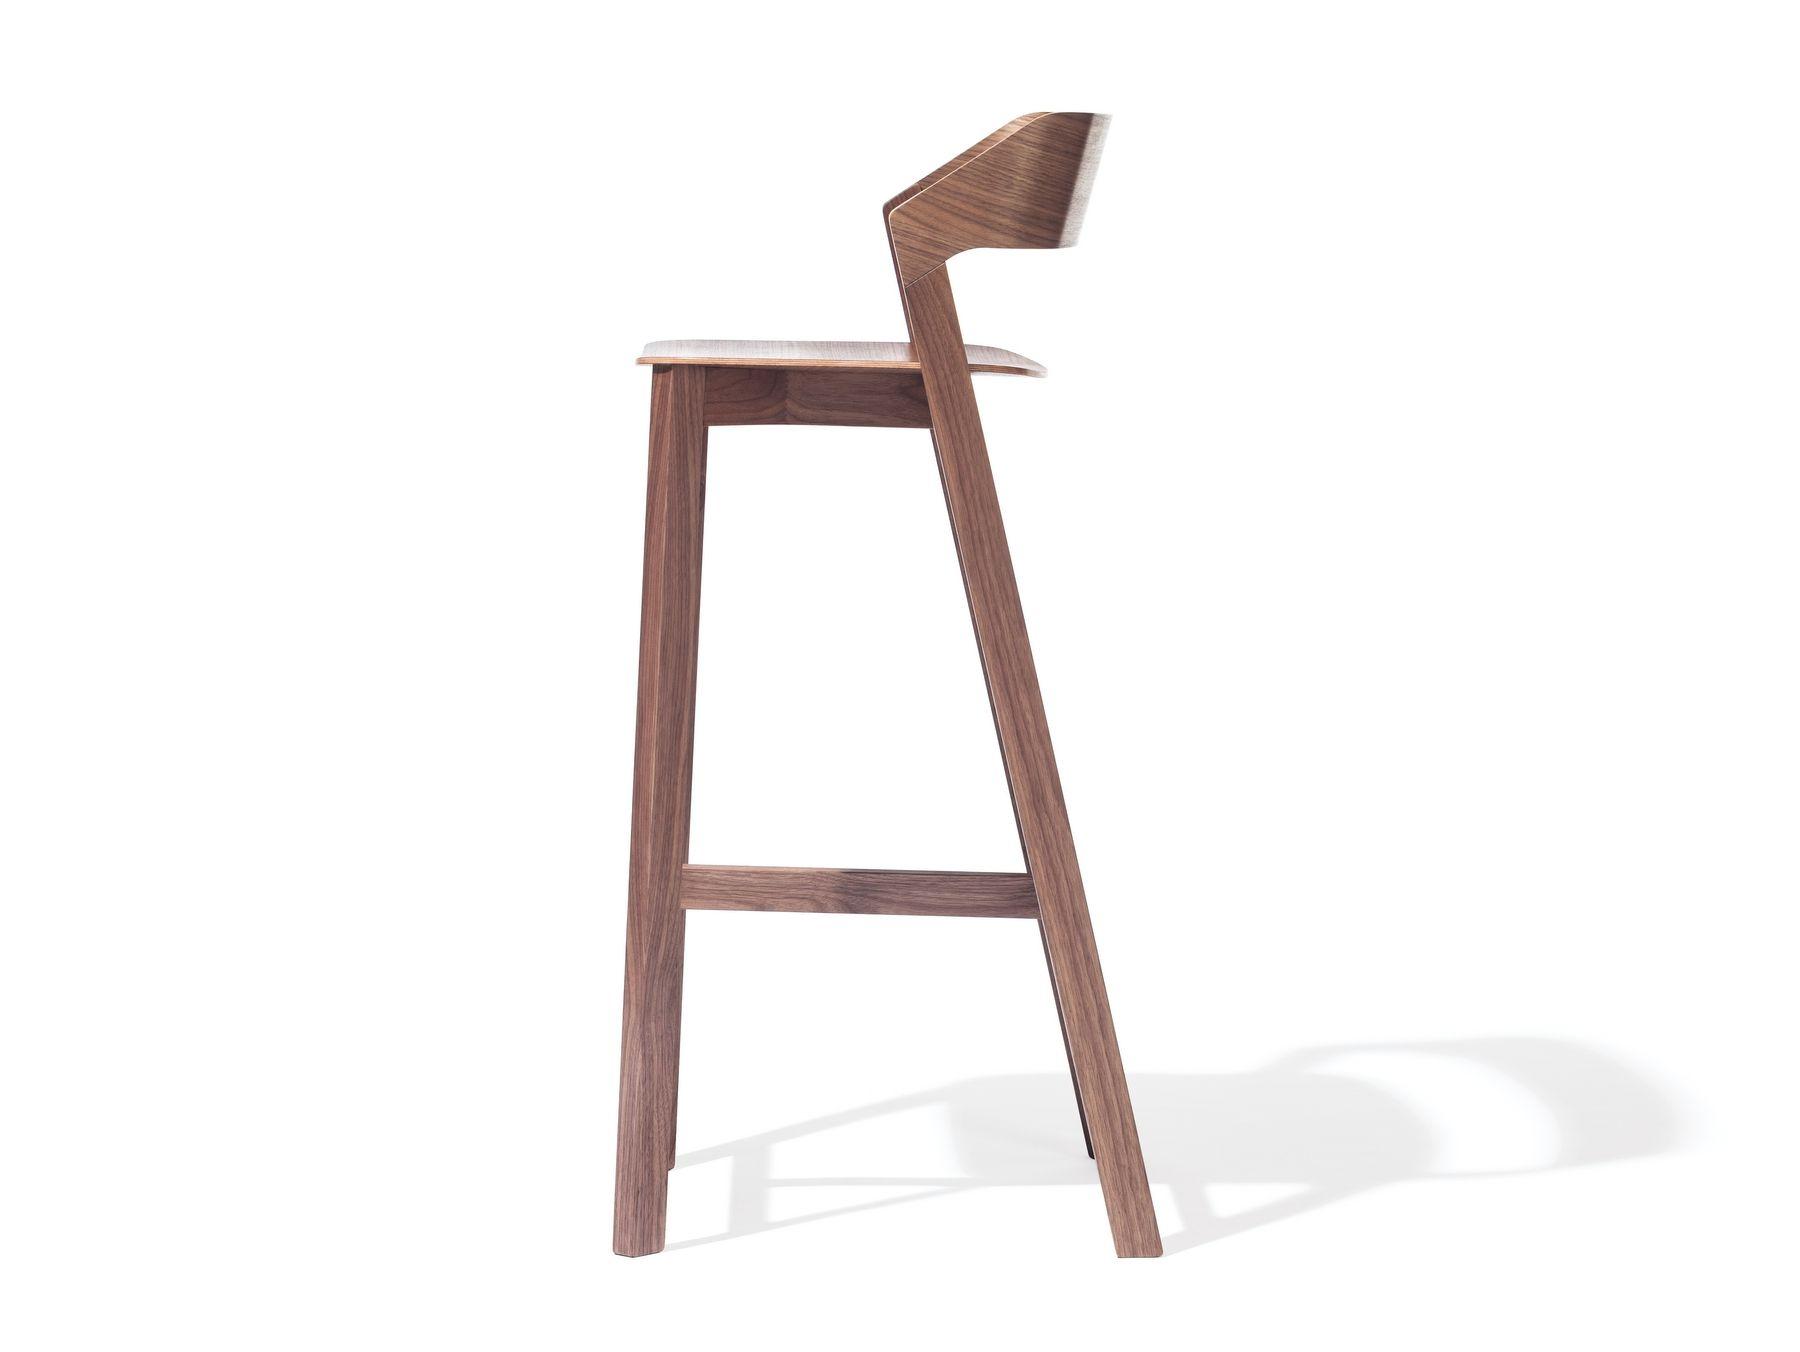 Silla alta de madera maciza con reposapi s merano for Sillas altas de madera